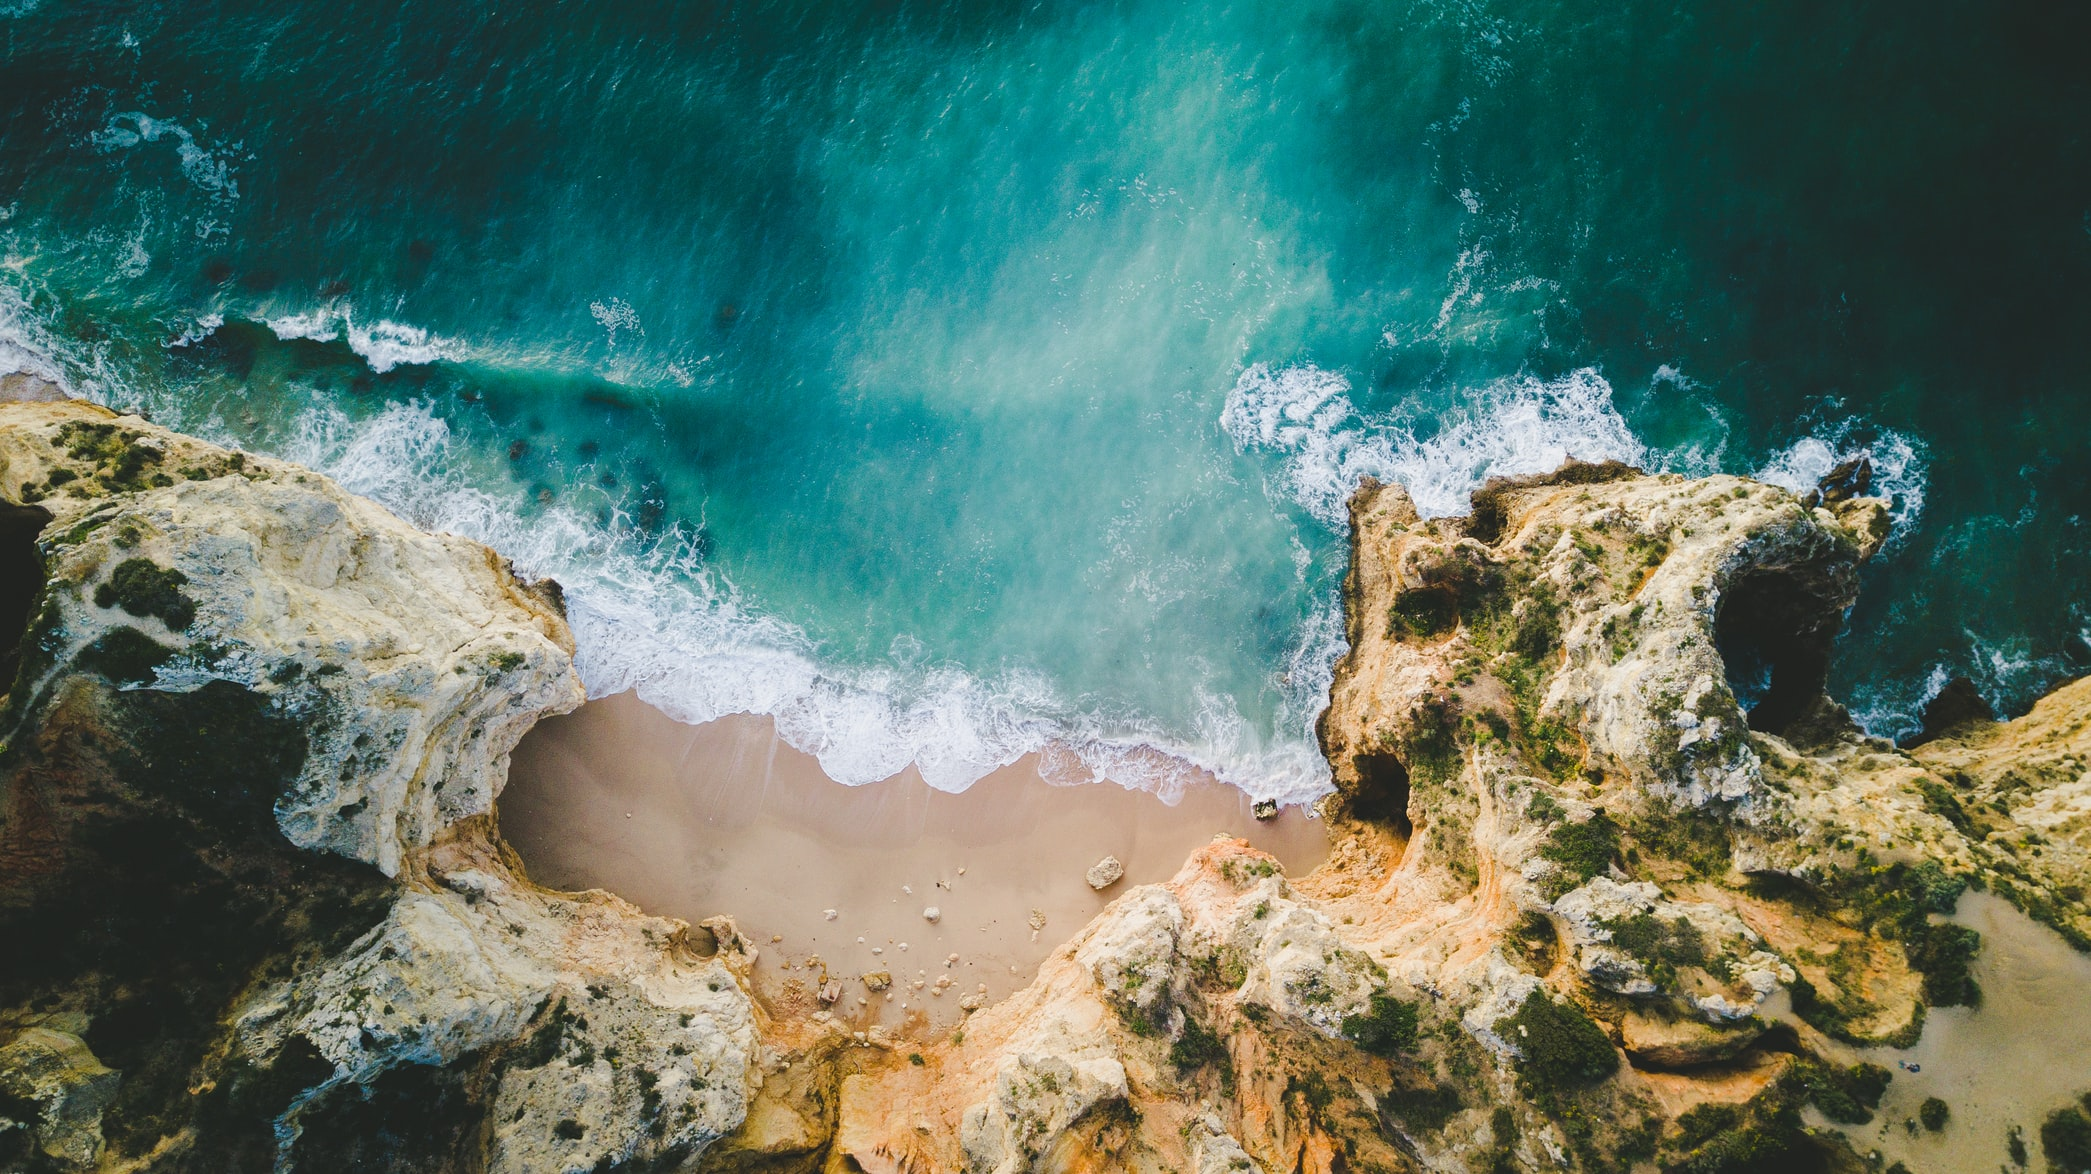 viajes ecologicos Algarve portugal